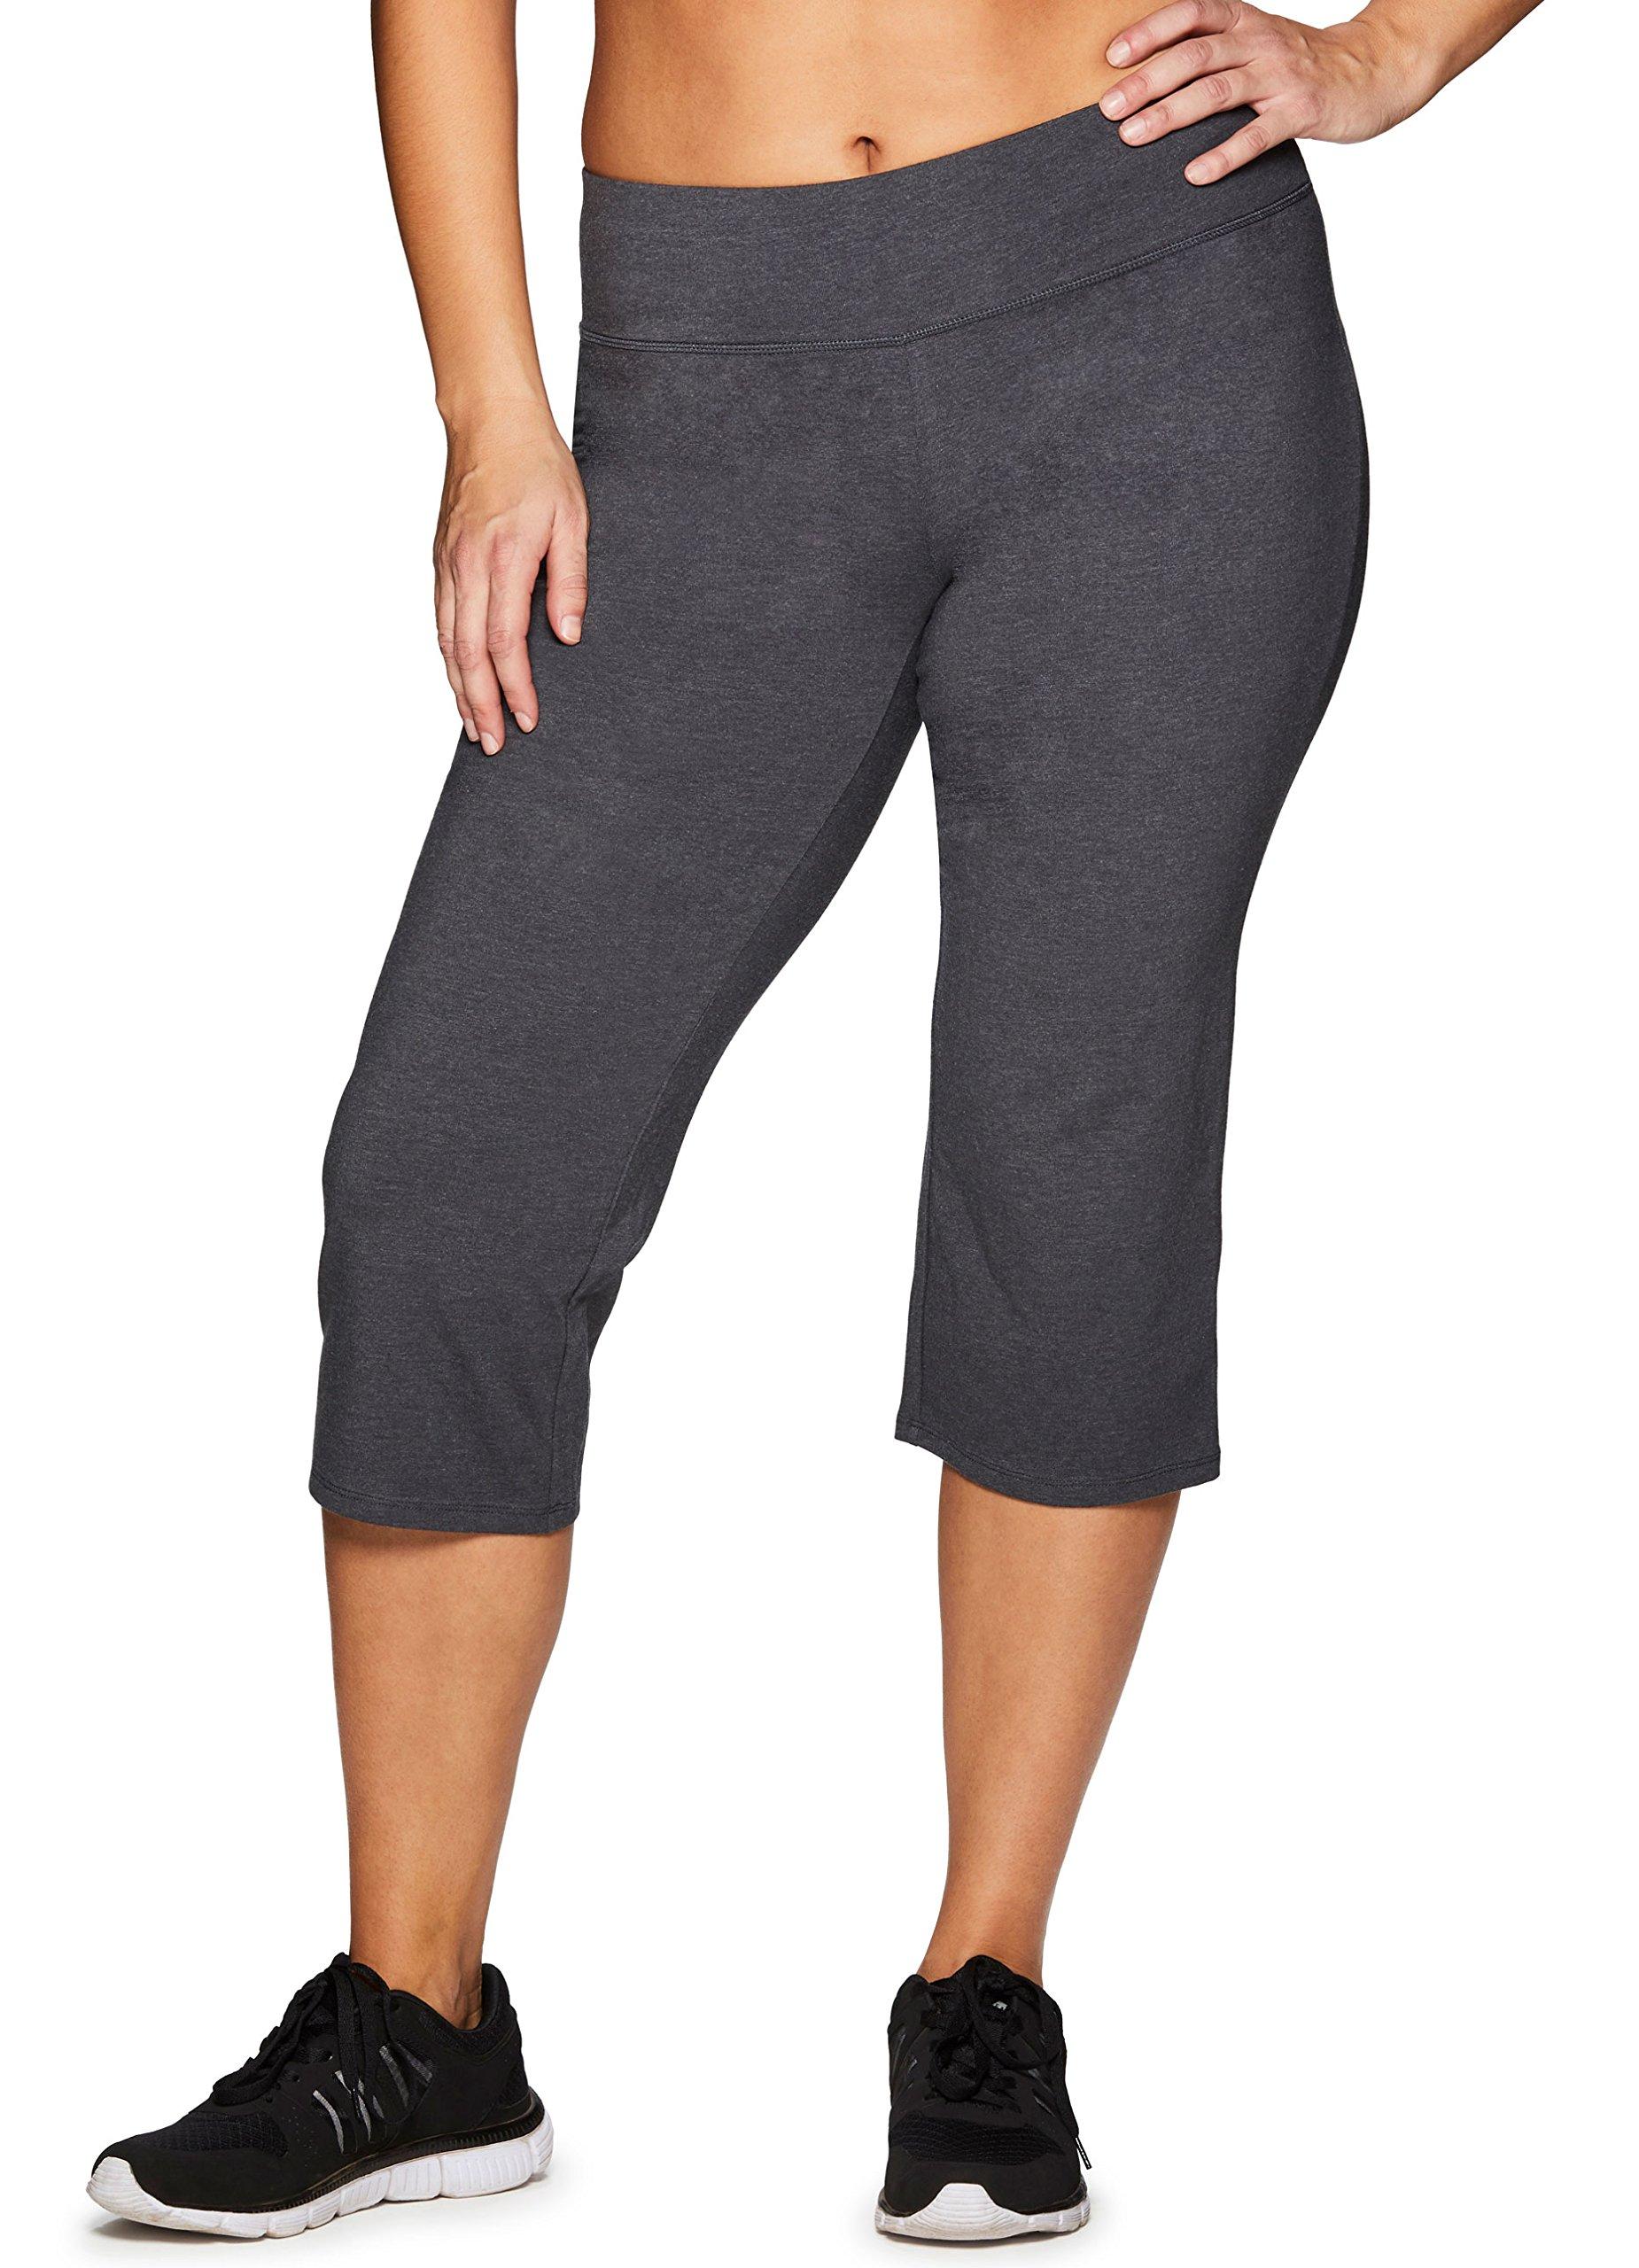 RBX Active Women's Plus Size Flared Cotton Spandex Capri Leggings Span Dark Grey 1X